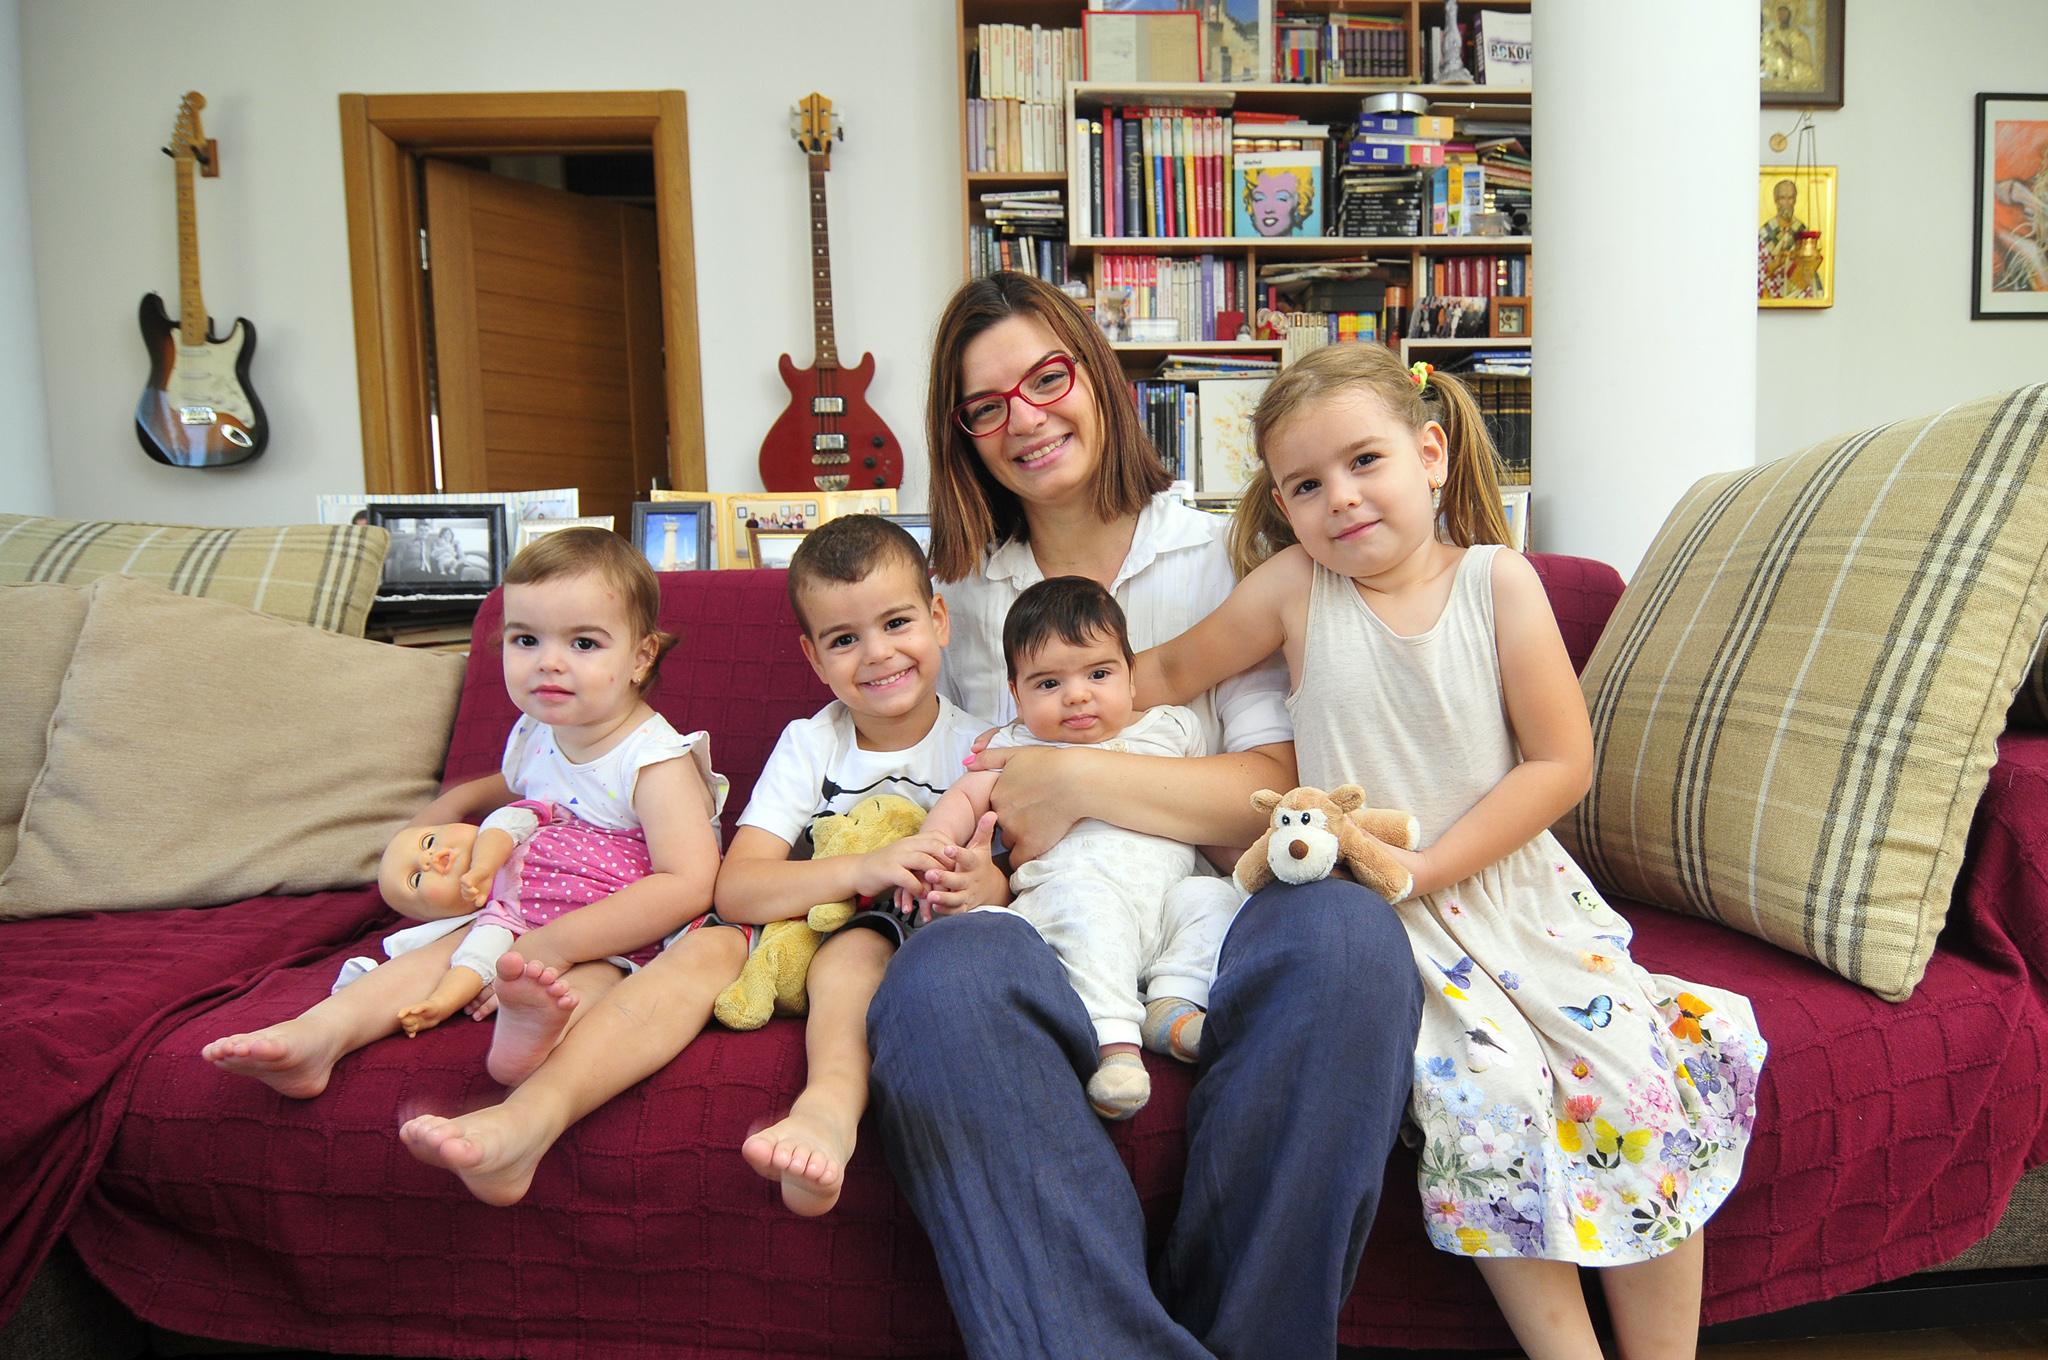 novi sad 21.07.2016 blic zena u srcu zene Milena kostic Introventna majka foto Robert Getel